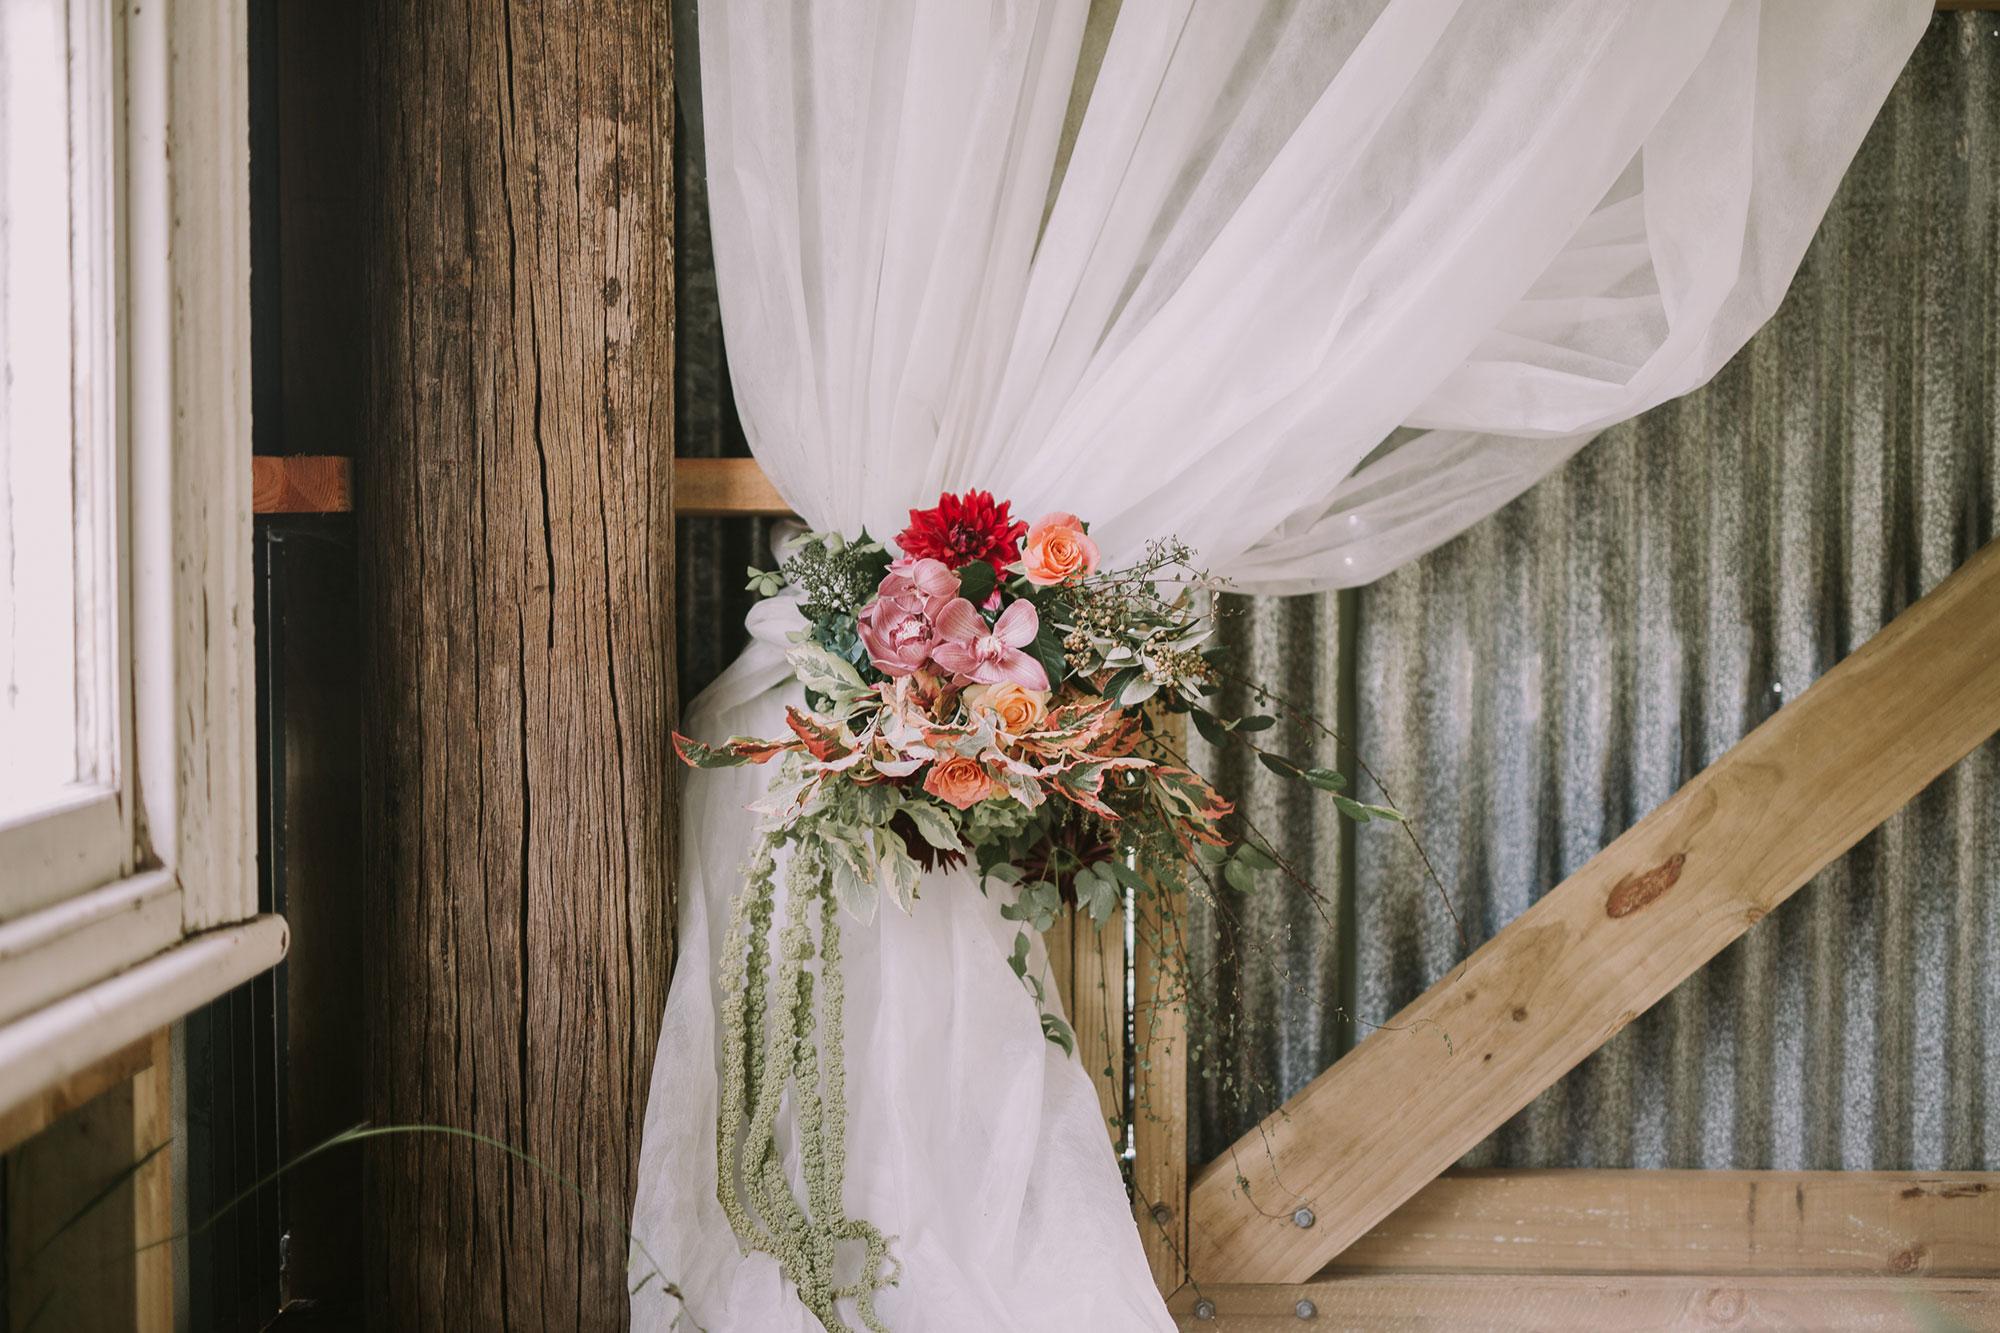 RUSTIC TAURANGA WEDDING VENUE